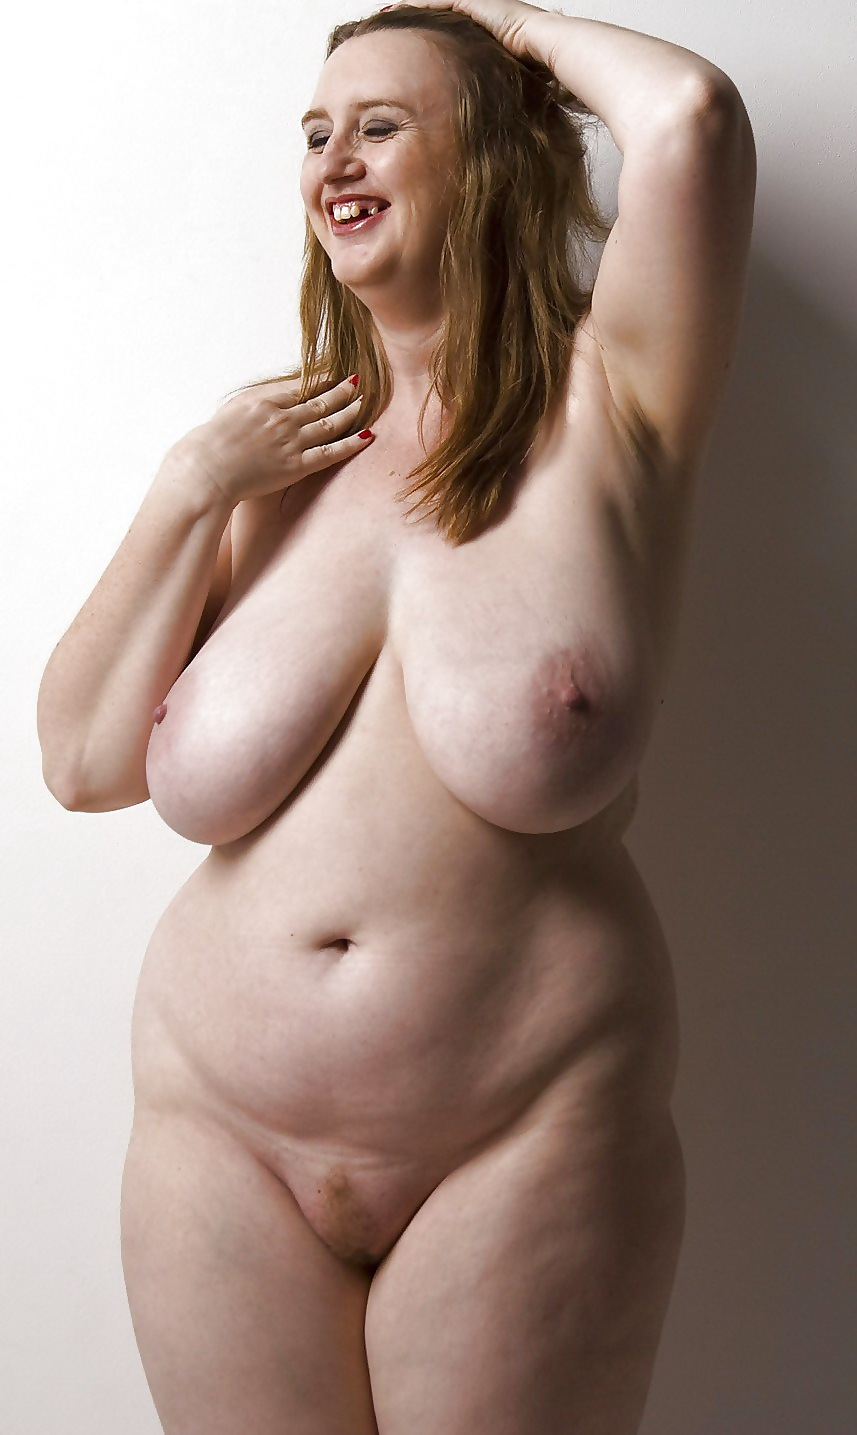 Nude Images Slow teasing gay handjob